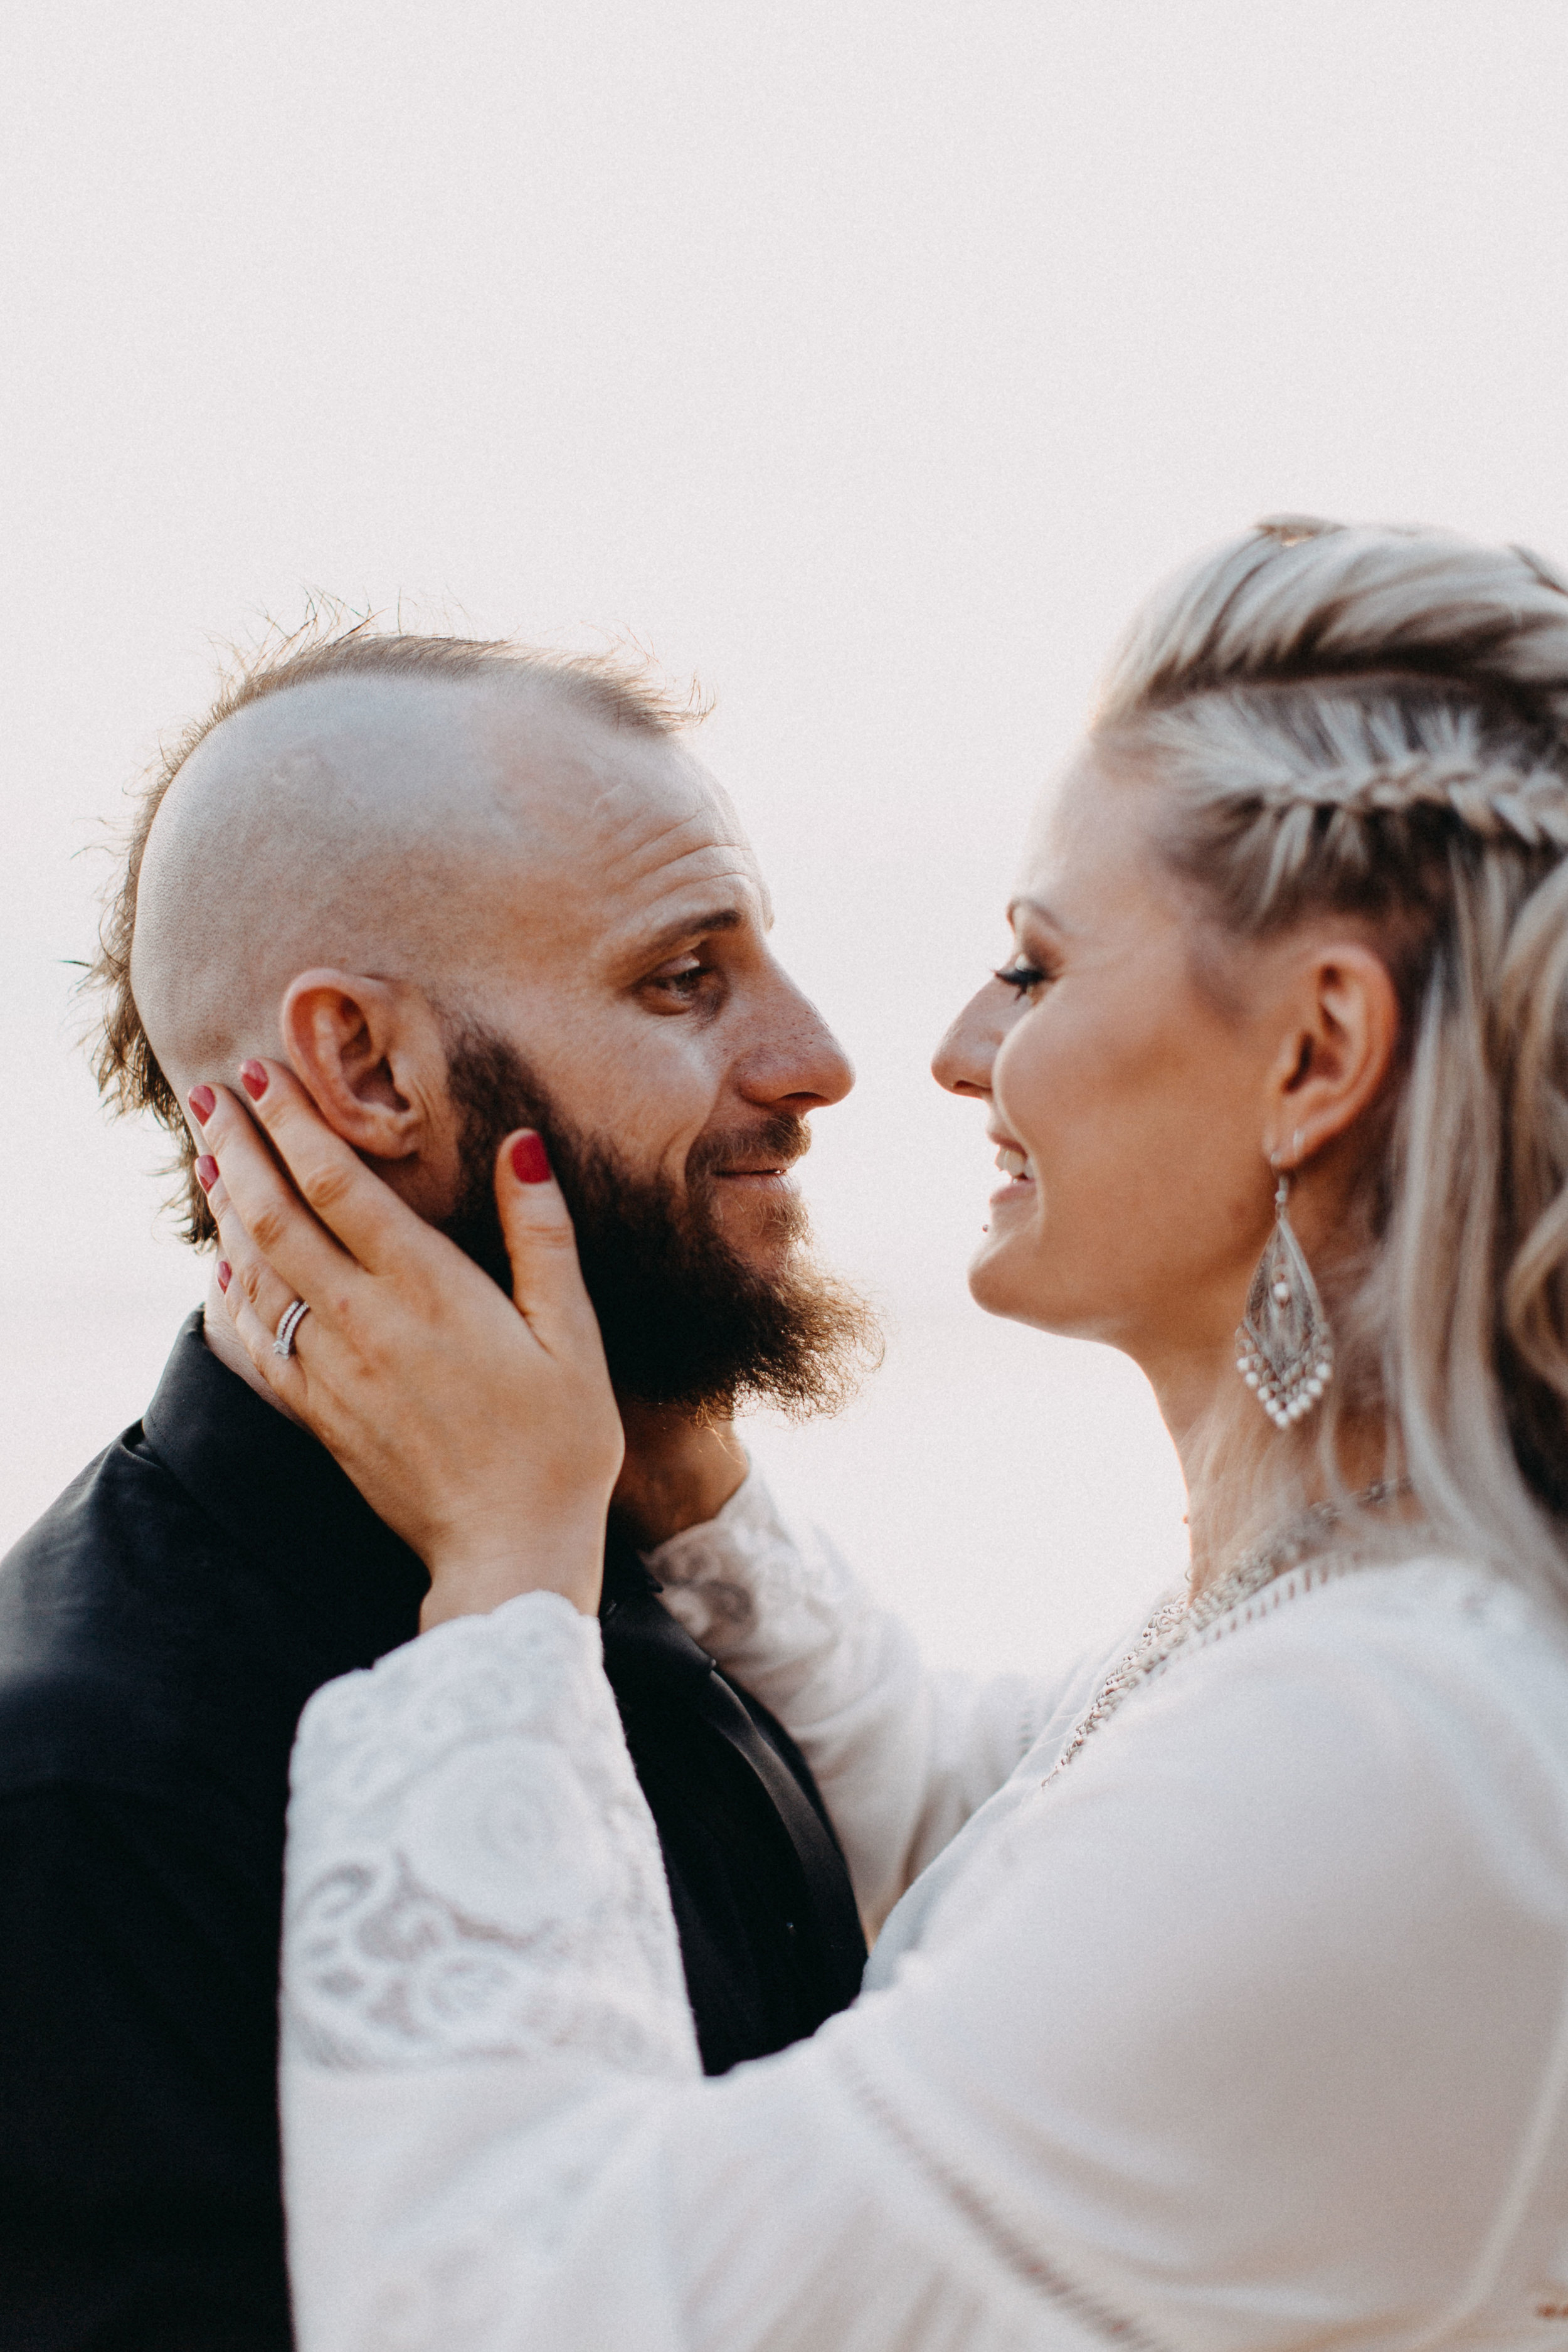 darwin-elopement-wedding-beach-camden-photography-www.emilyobrienphotography.net-88.jpg